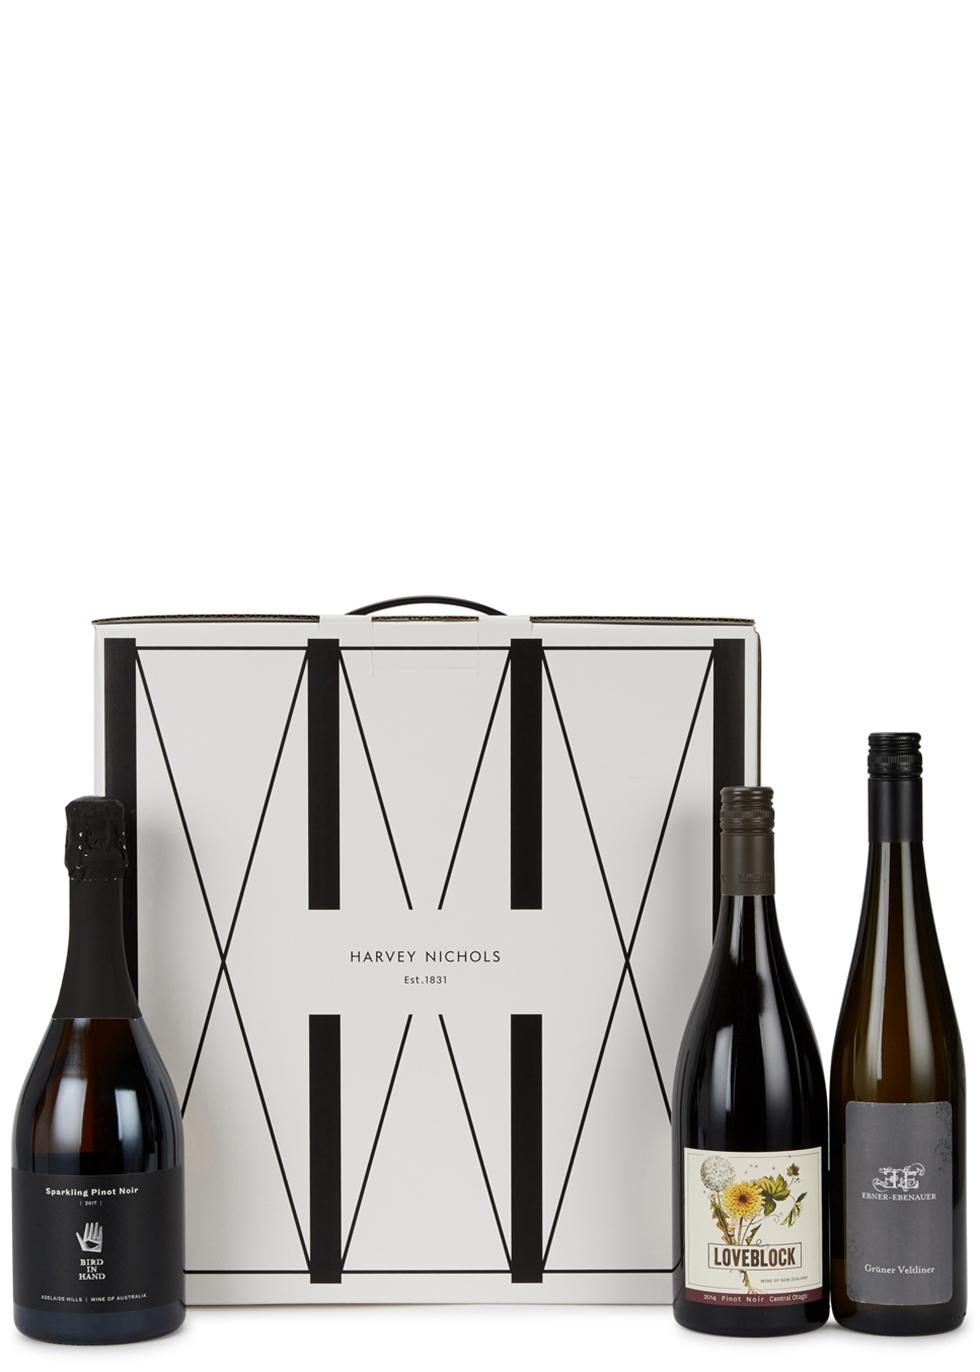 Summer Lovers Wine Collection - Harvey Nichols